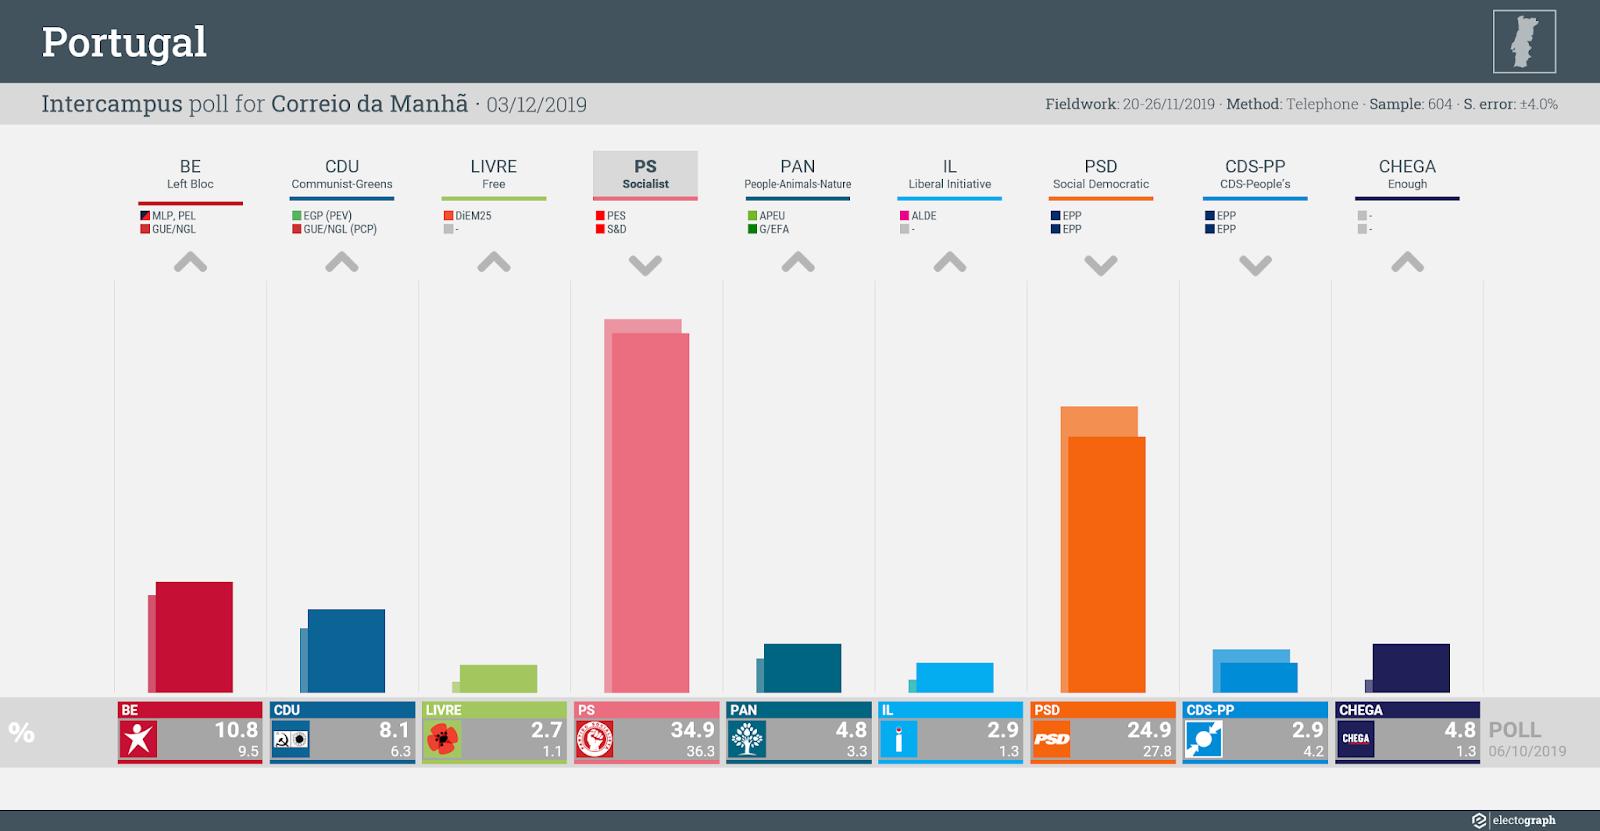 PORTUGAL: Intercampus poll chart for Correio da Manhã, 3 December 2019